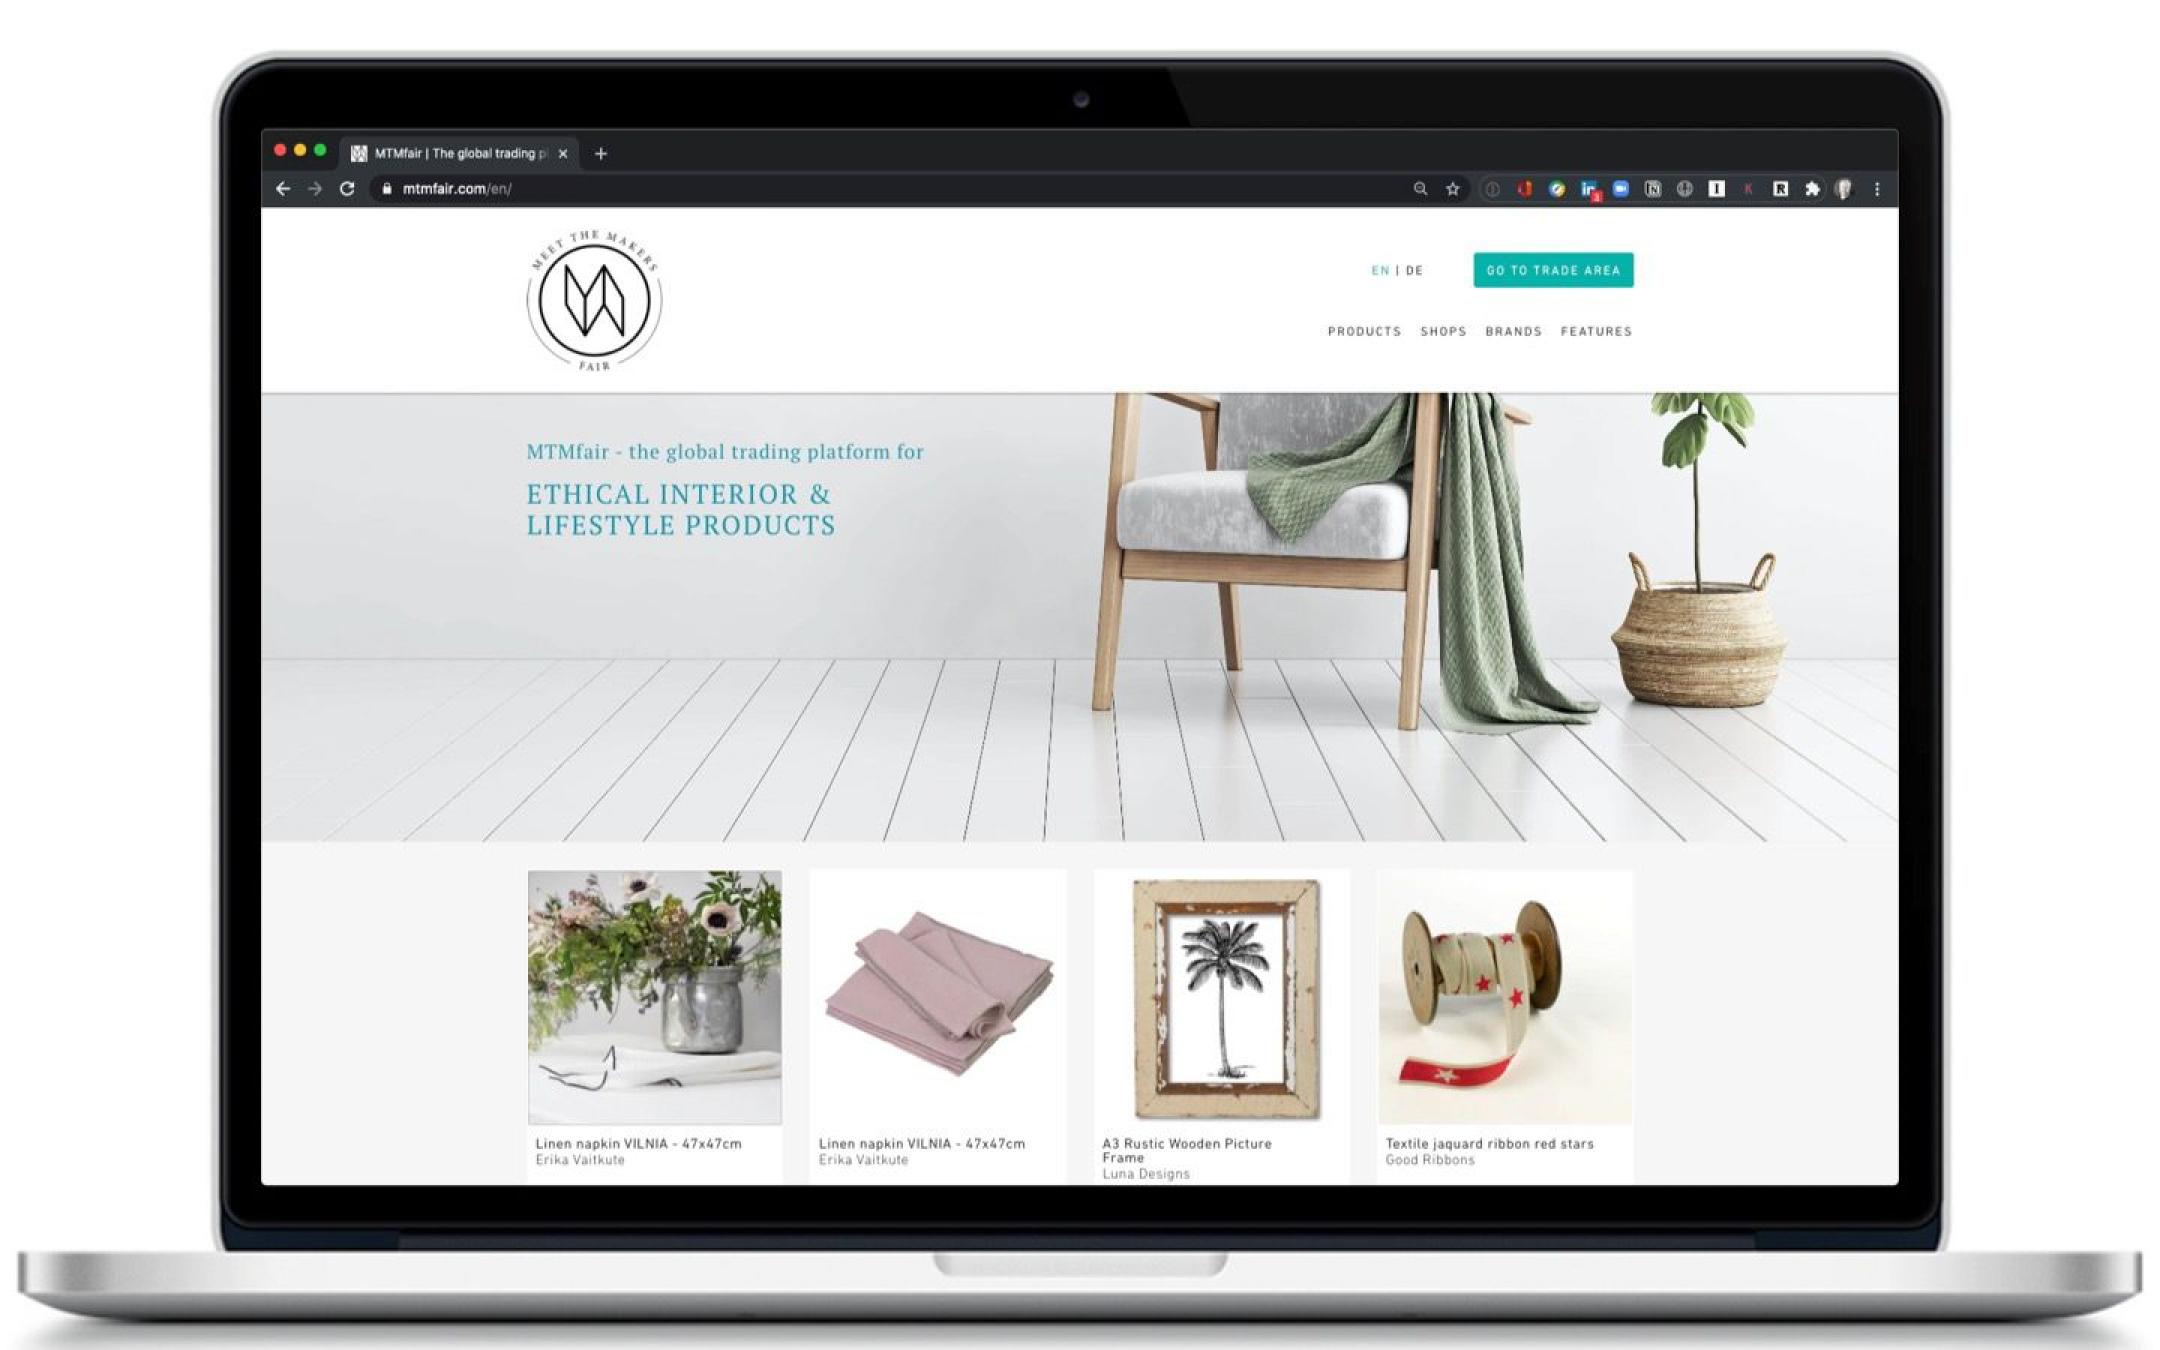 MTMfair.com